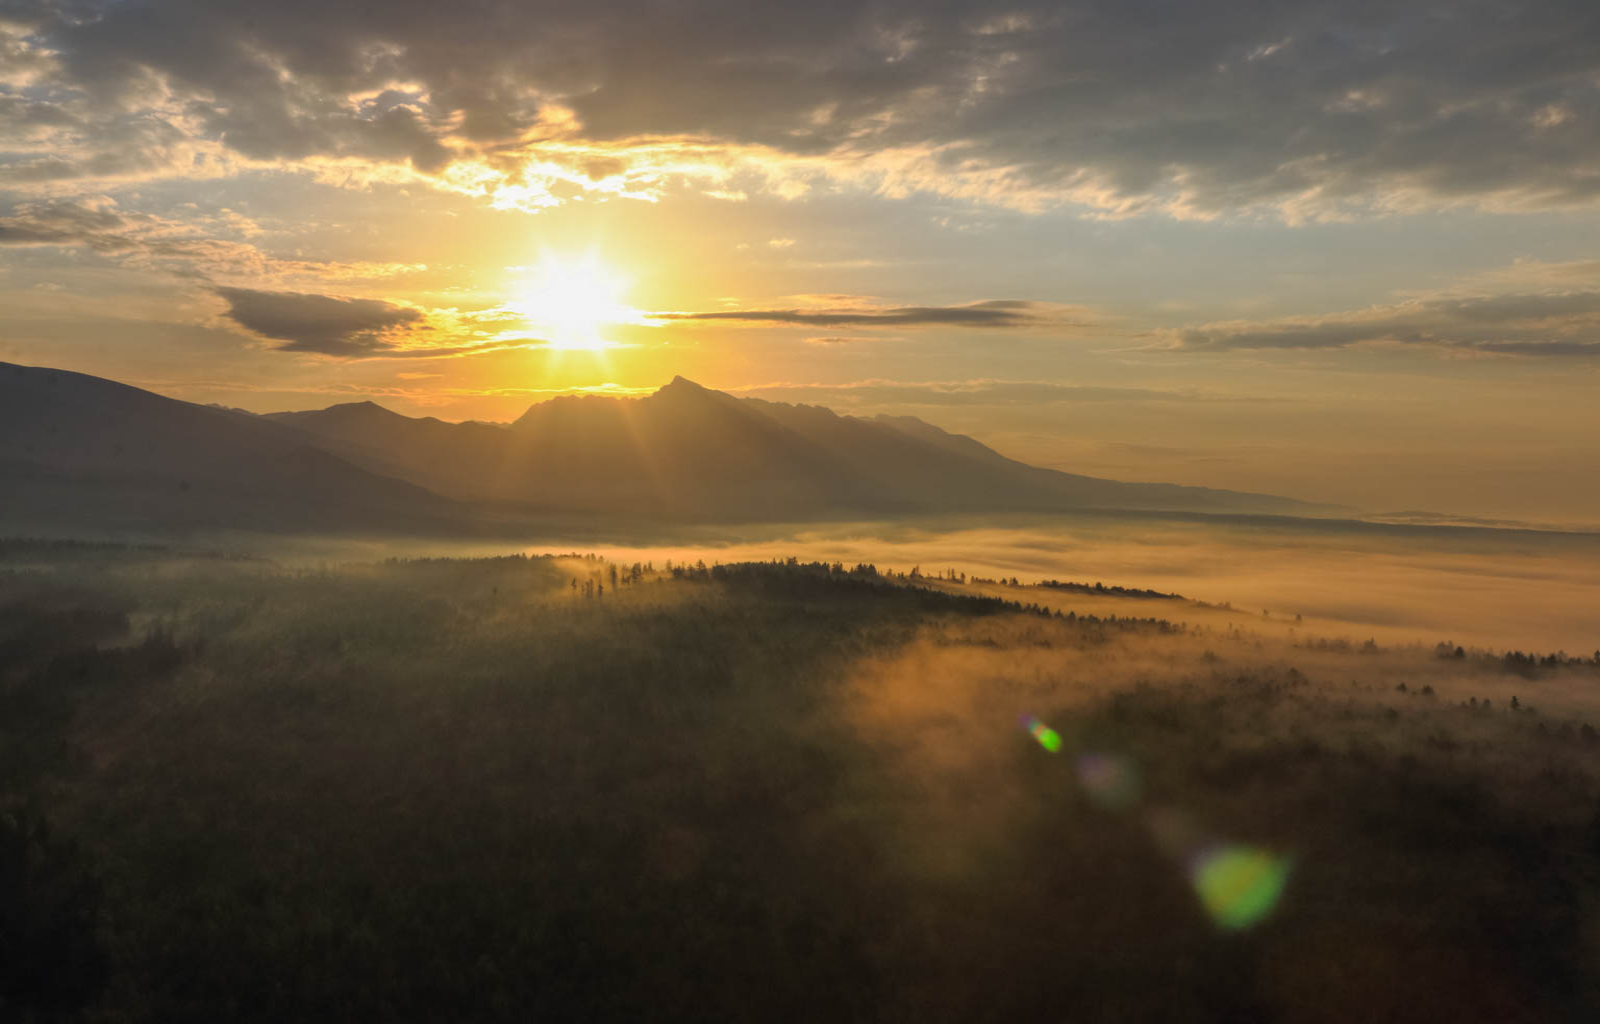 Bela WILDRIver ZivaRiekaErik Arola - 00005.jpg - European Wilderness Society - CC NonCommercial-NoDerivates 4.0 International